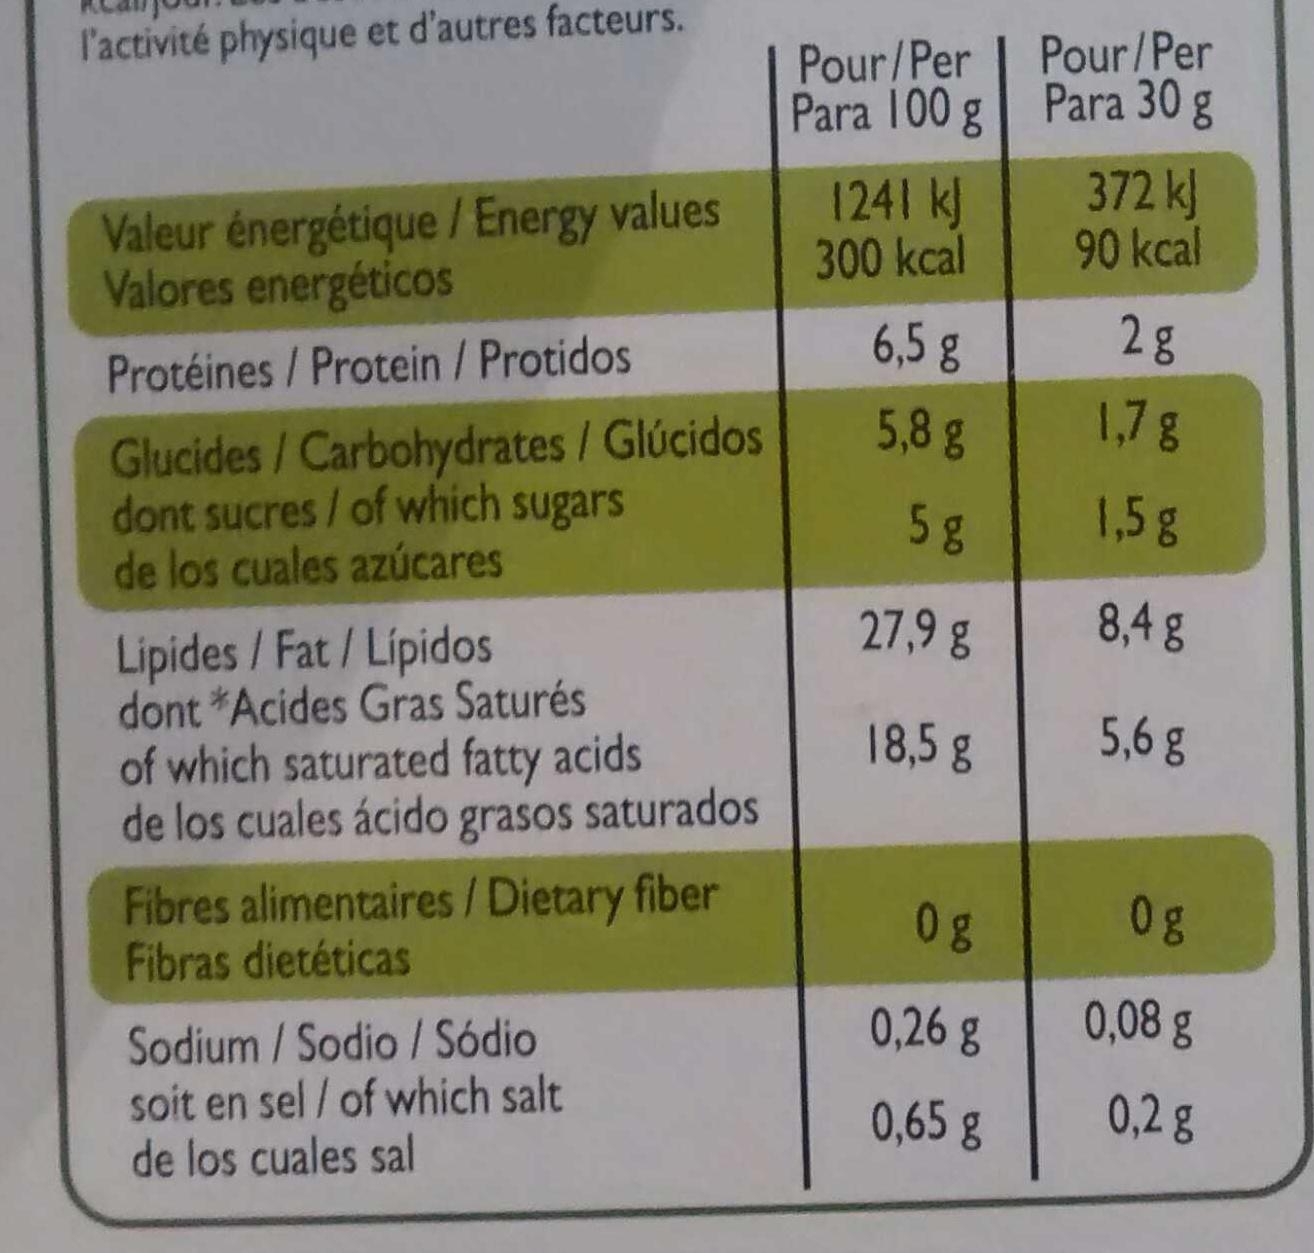 fromage tartiner raisin figue et noix 27 9 mg leader price 125 g. Black Bedroom Furniture Sets. Home Design Ideas